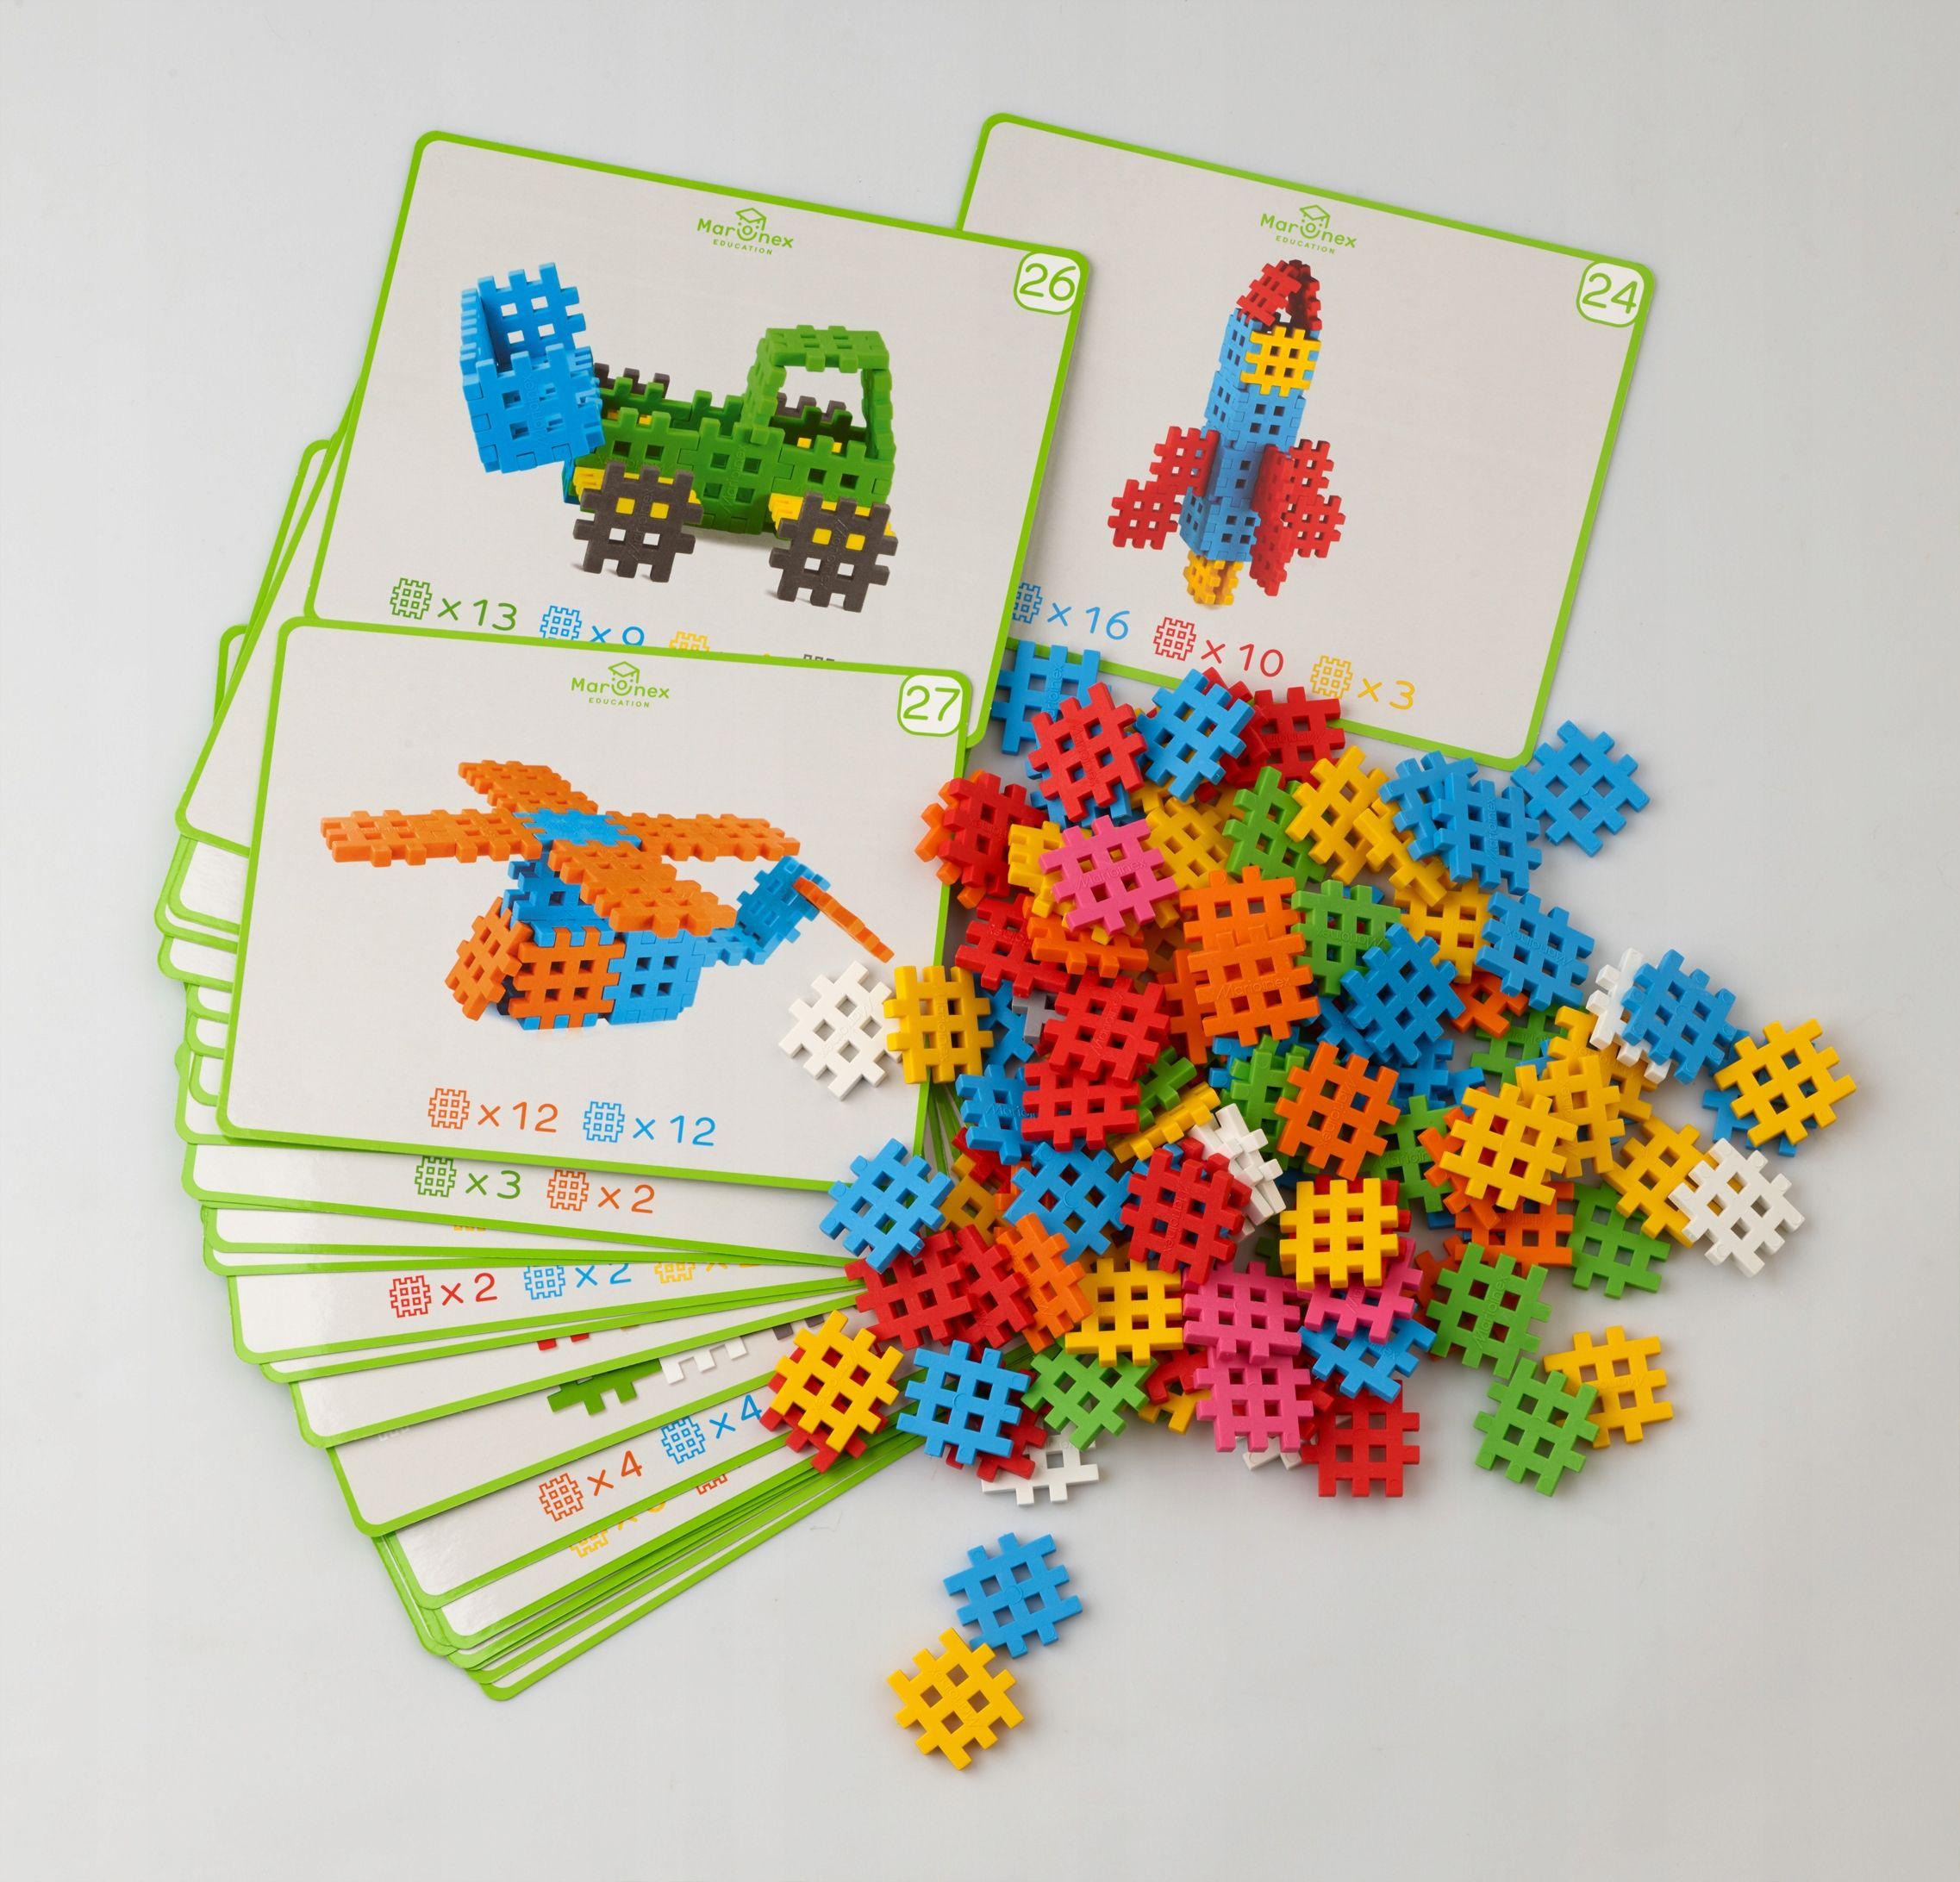 Oryginalne Wafle Klocki Mini Waffle 500 Edu Kartyd 7872335365 Oficjalne Archiwum Allegro Diy Crafts For Kids Crafts Diy Crafts